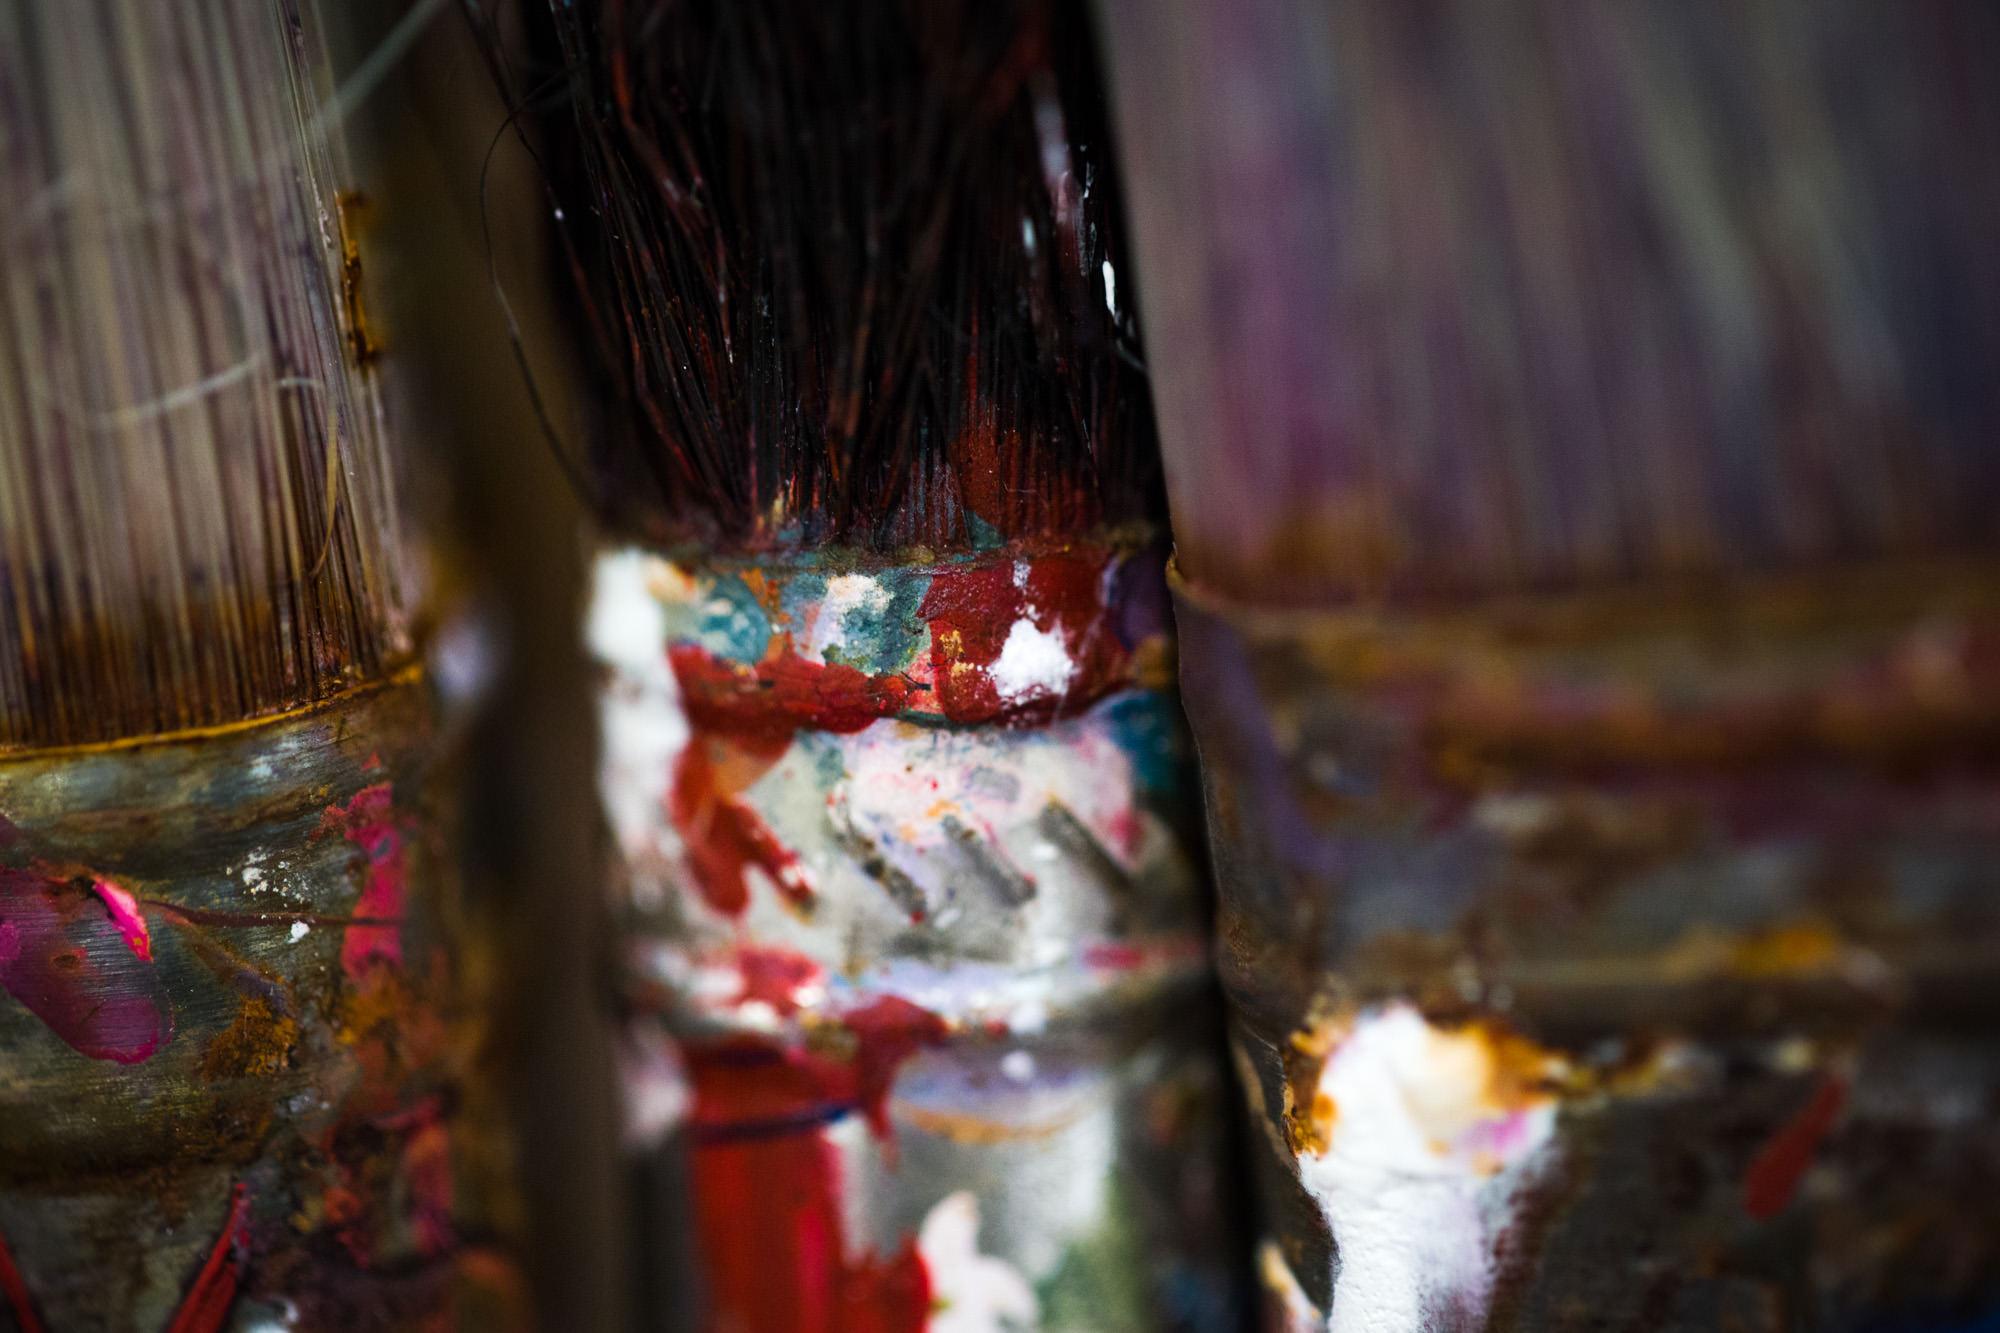 Studio Paintbrushes - Small - 04.jpg